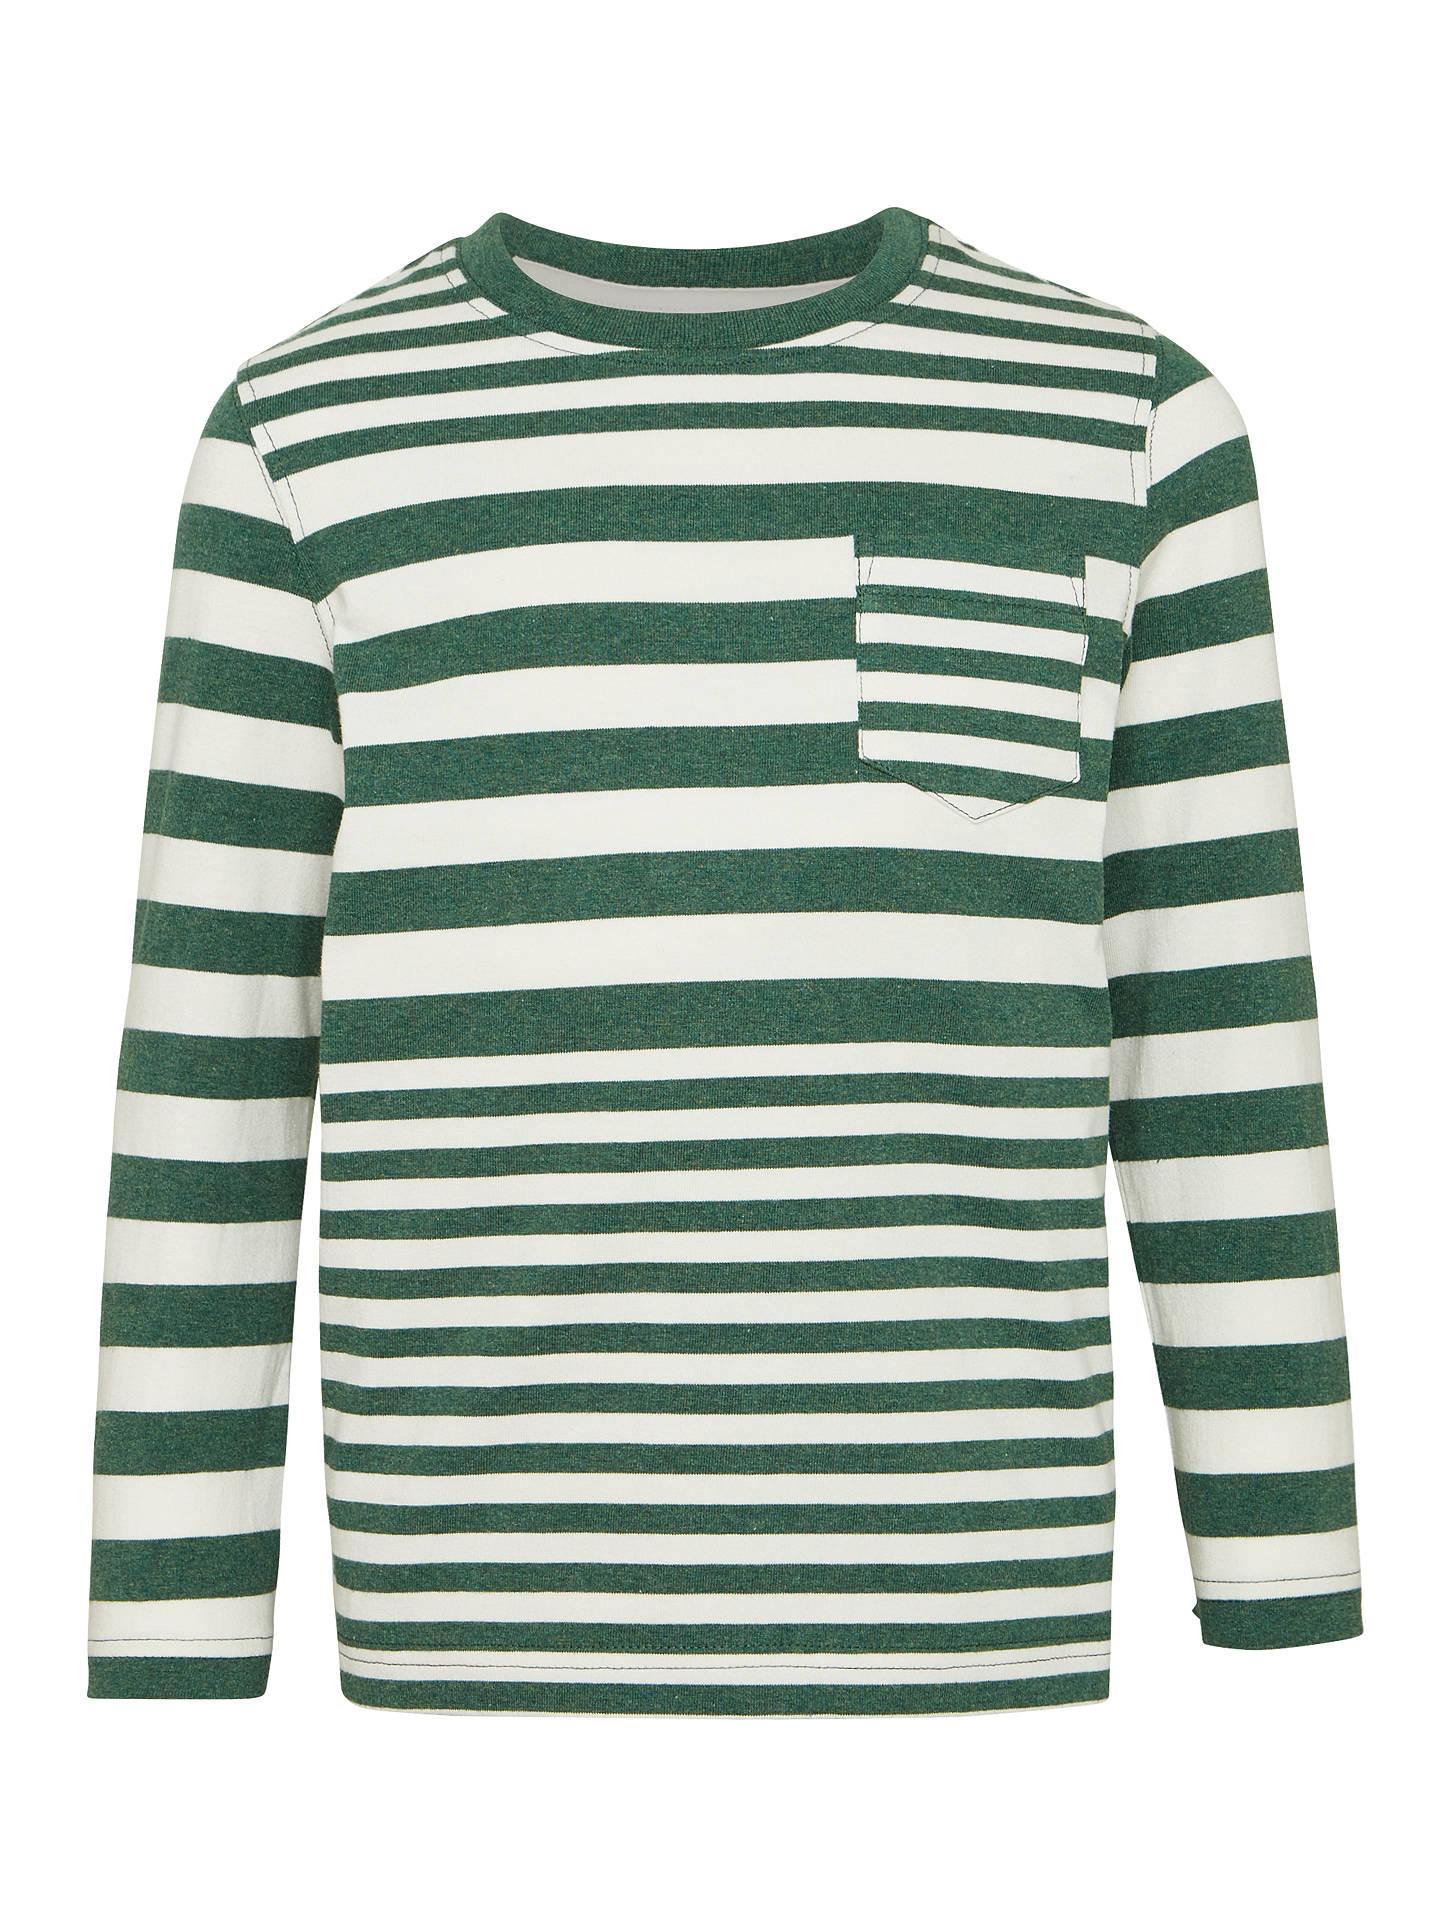 f420d304255b21 John Lewis Boys  Variegated Stripe T-Shirt at John Lewis   Partners